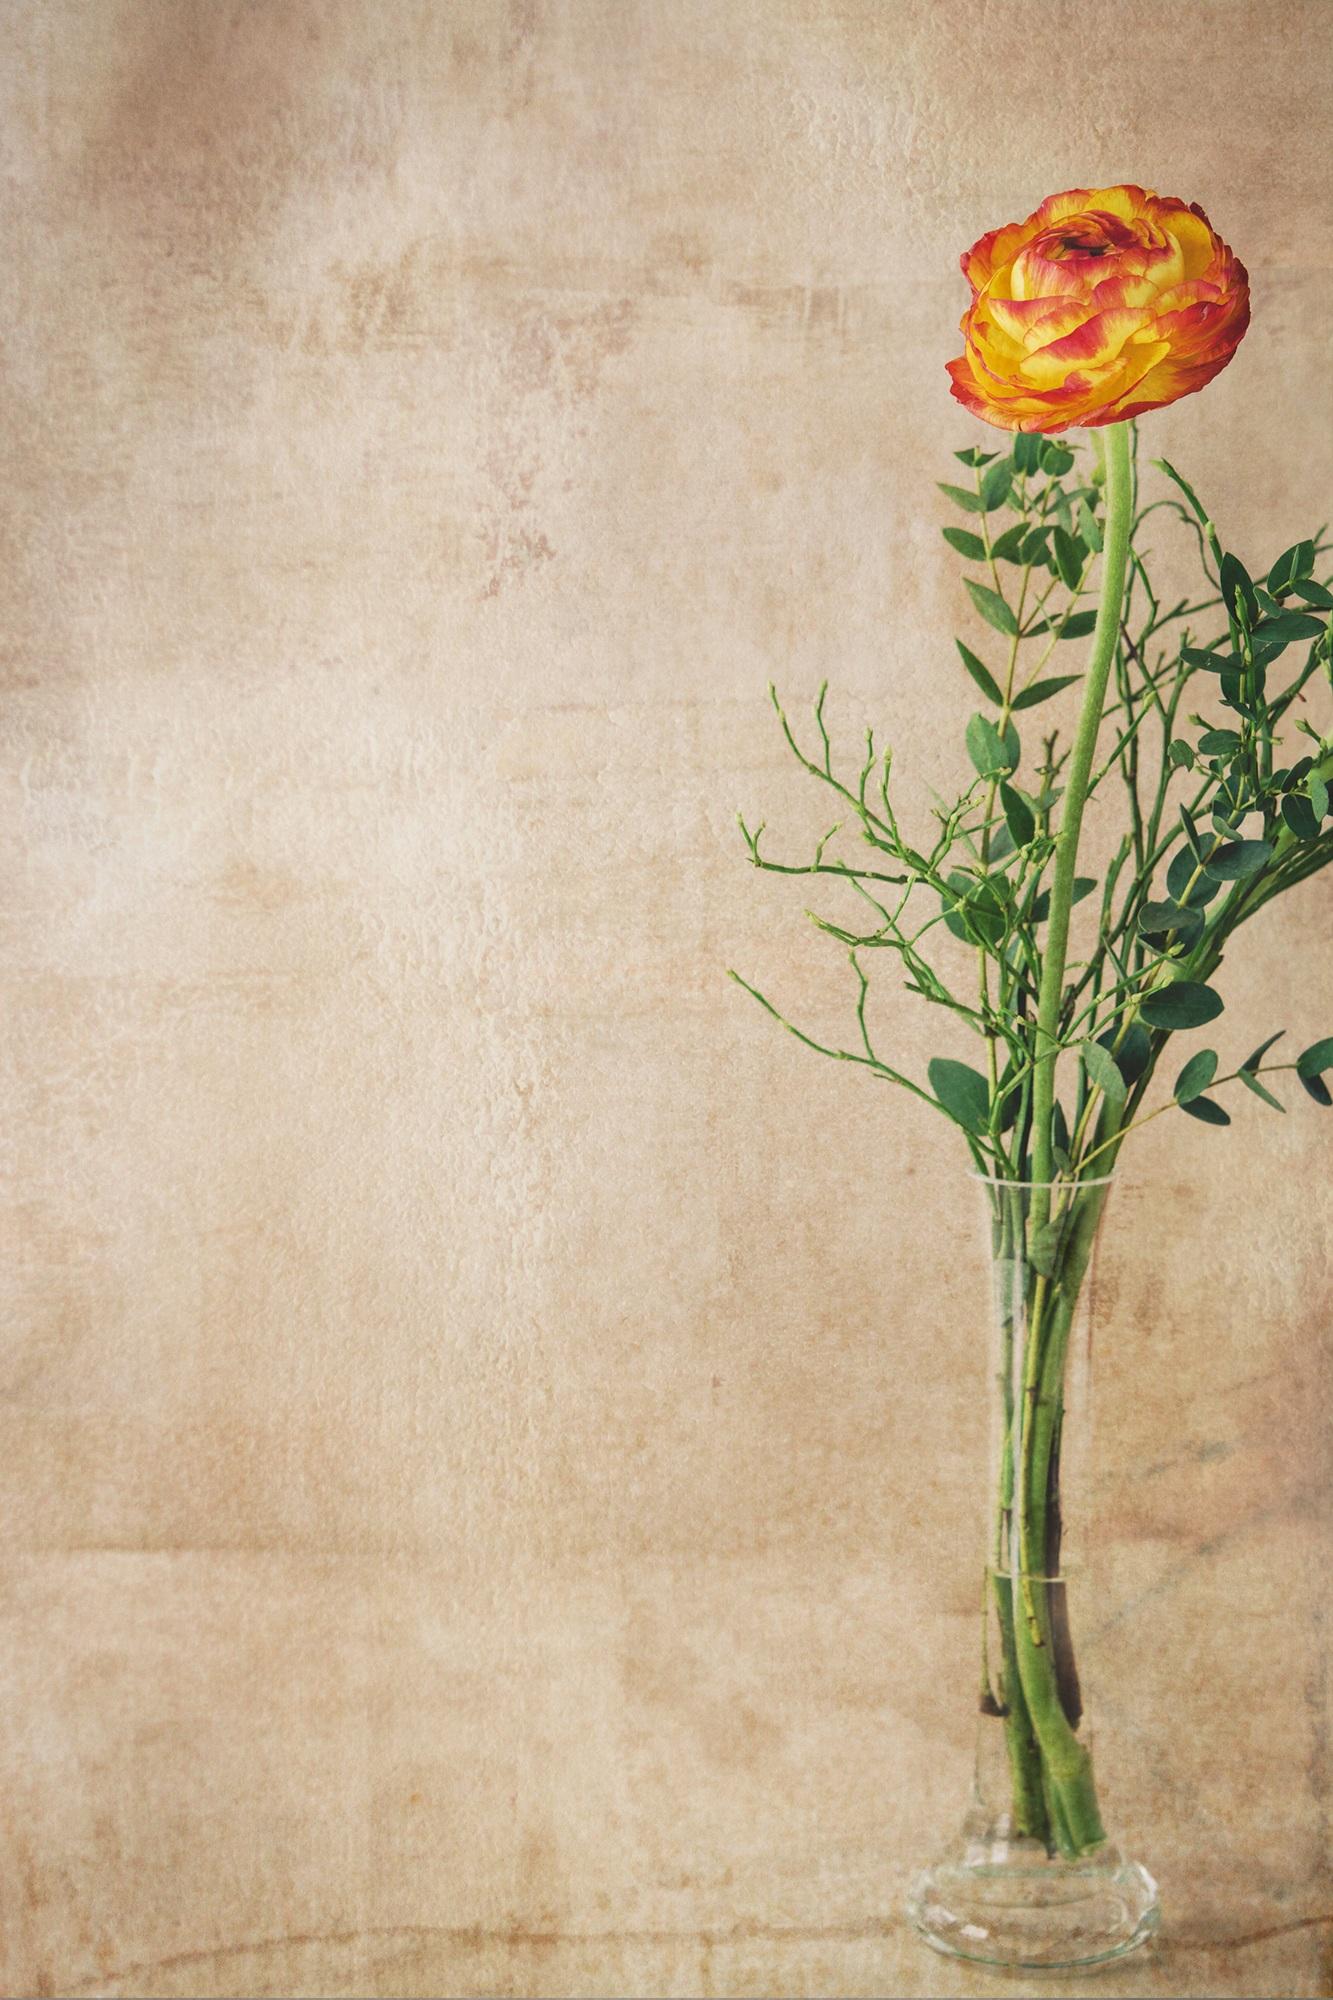 Gambar Cabang Mekar Menanam Berkembang Dekorasi Jeruk Hijau